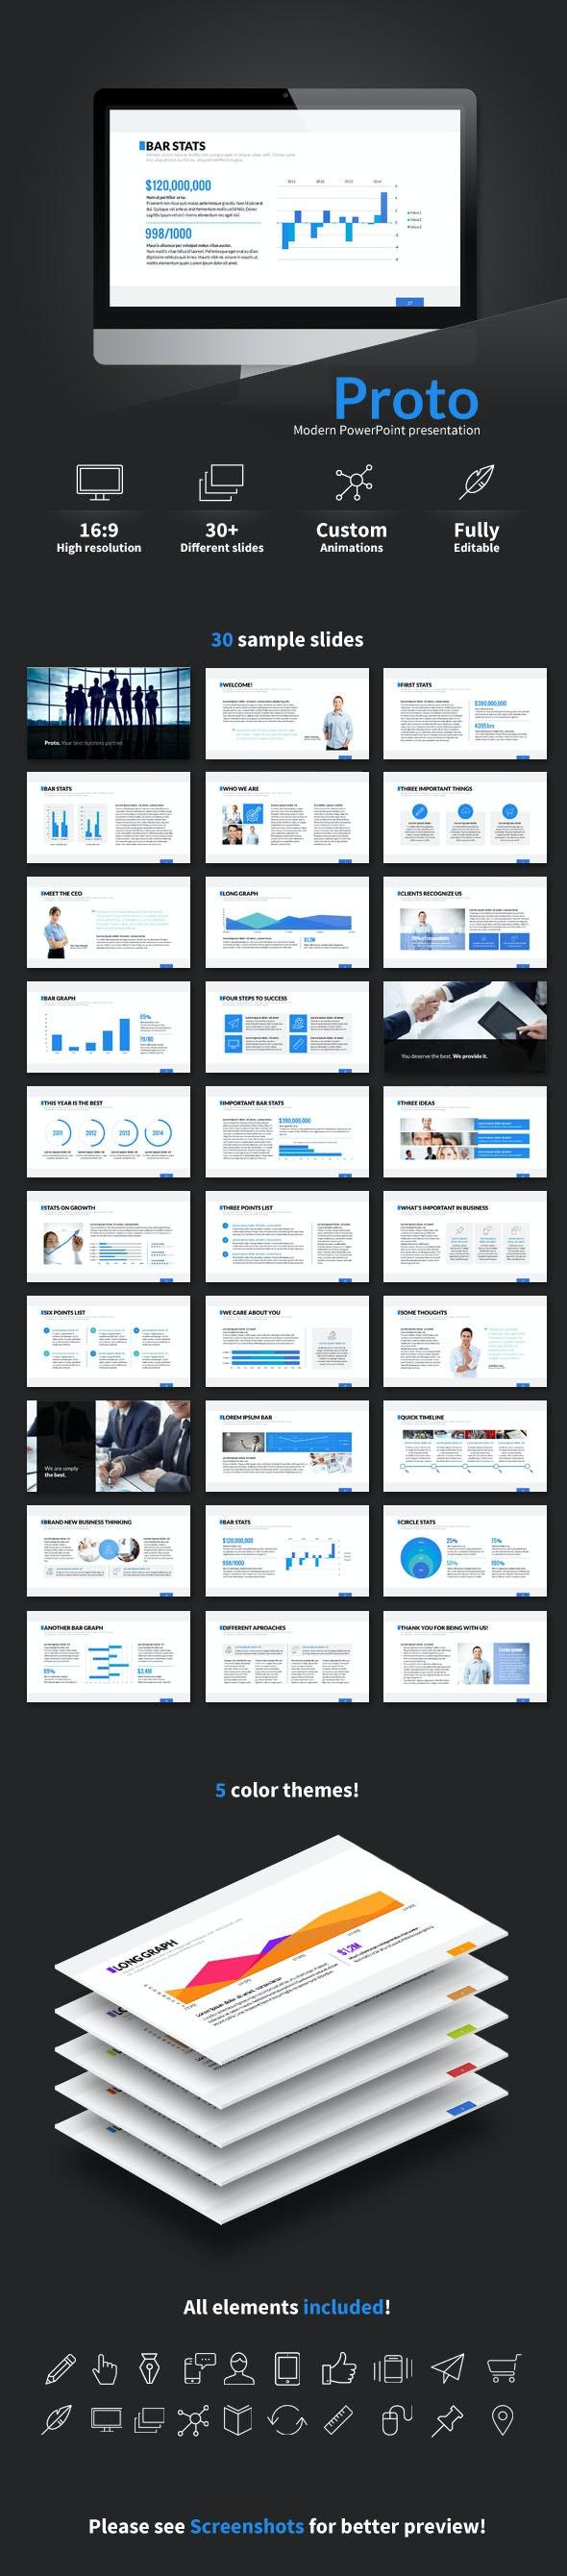 Proto PowerPoint presentation - Business PowerPoint Templates